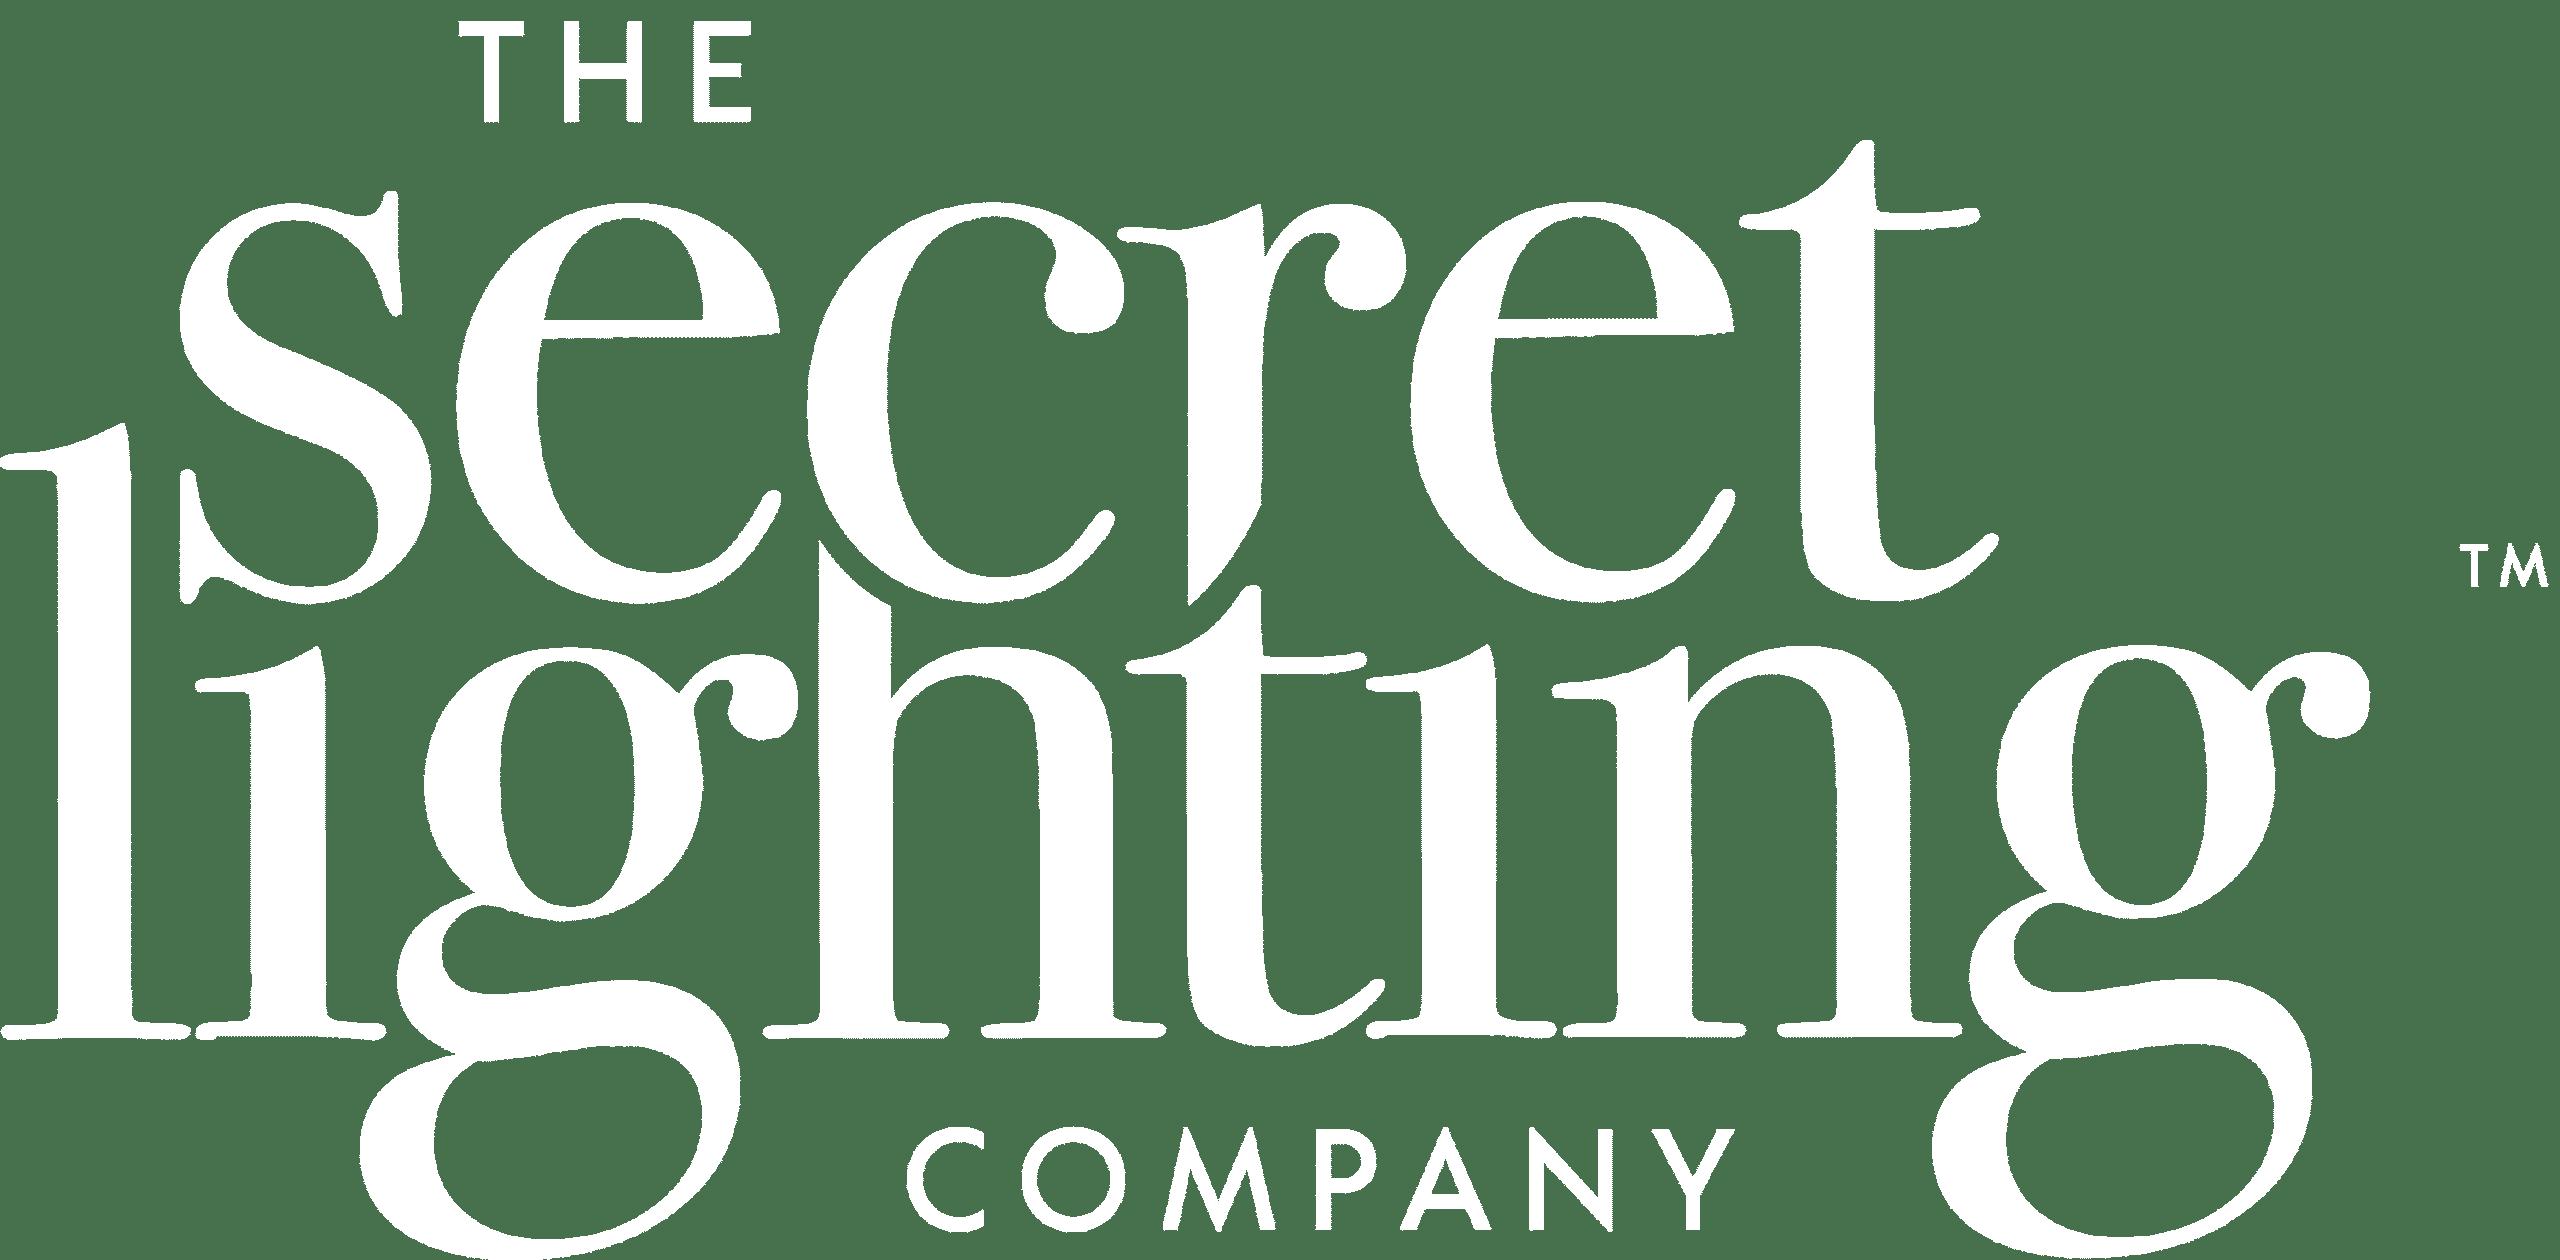 The Secret Lighting Company